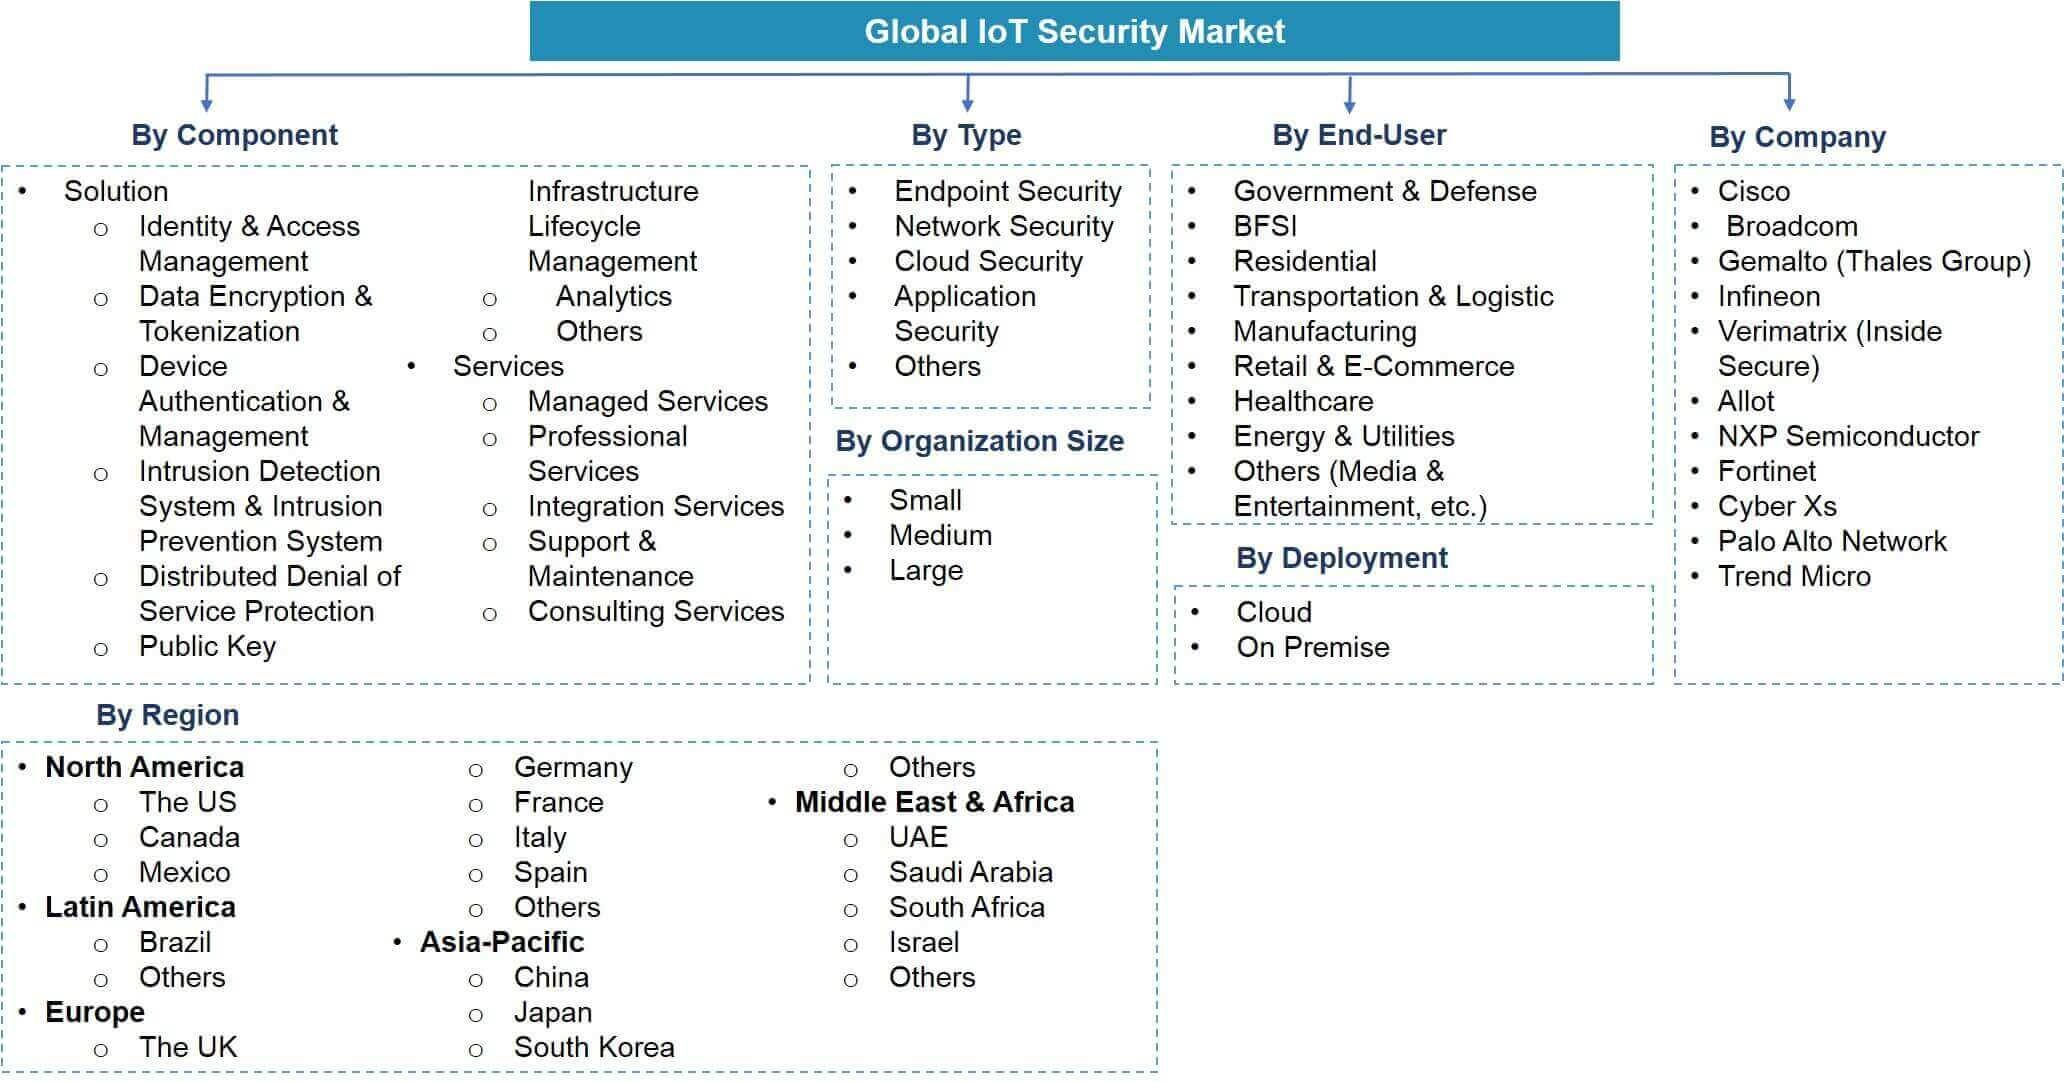 Global IoT Security Market Segmentation